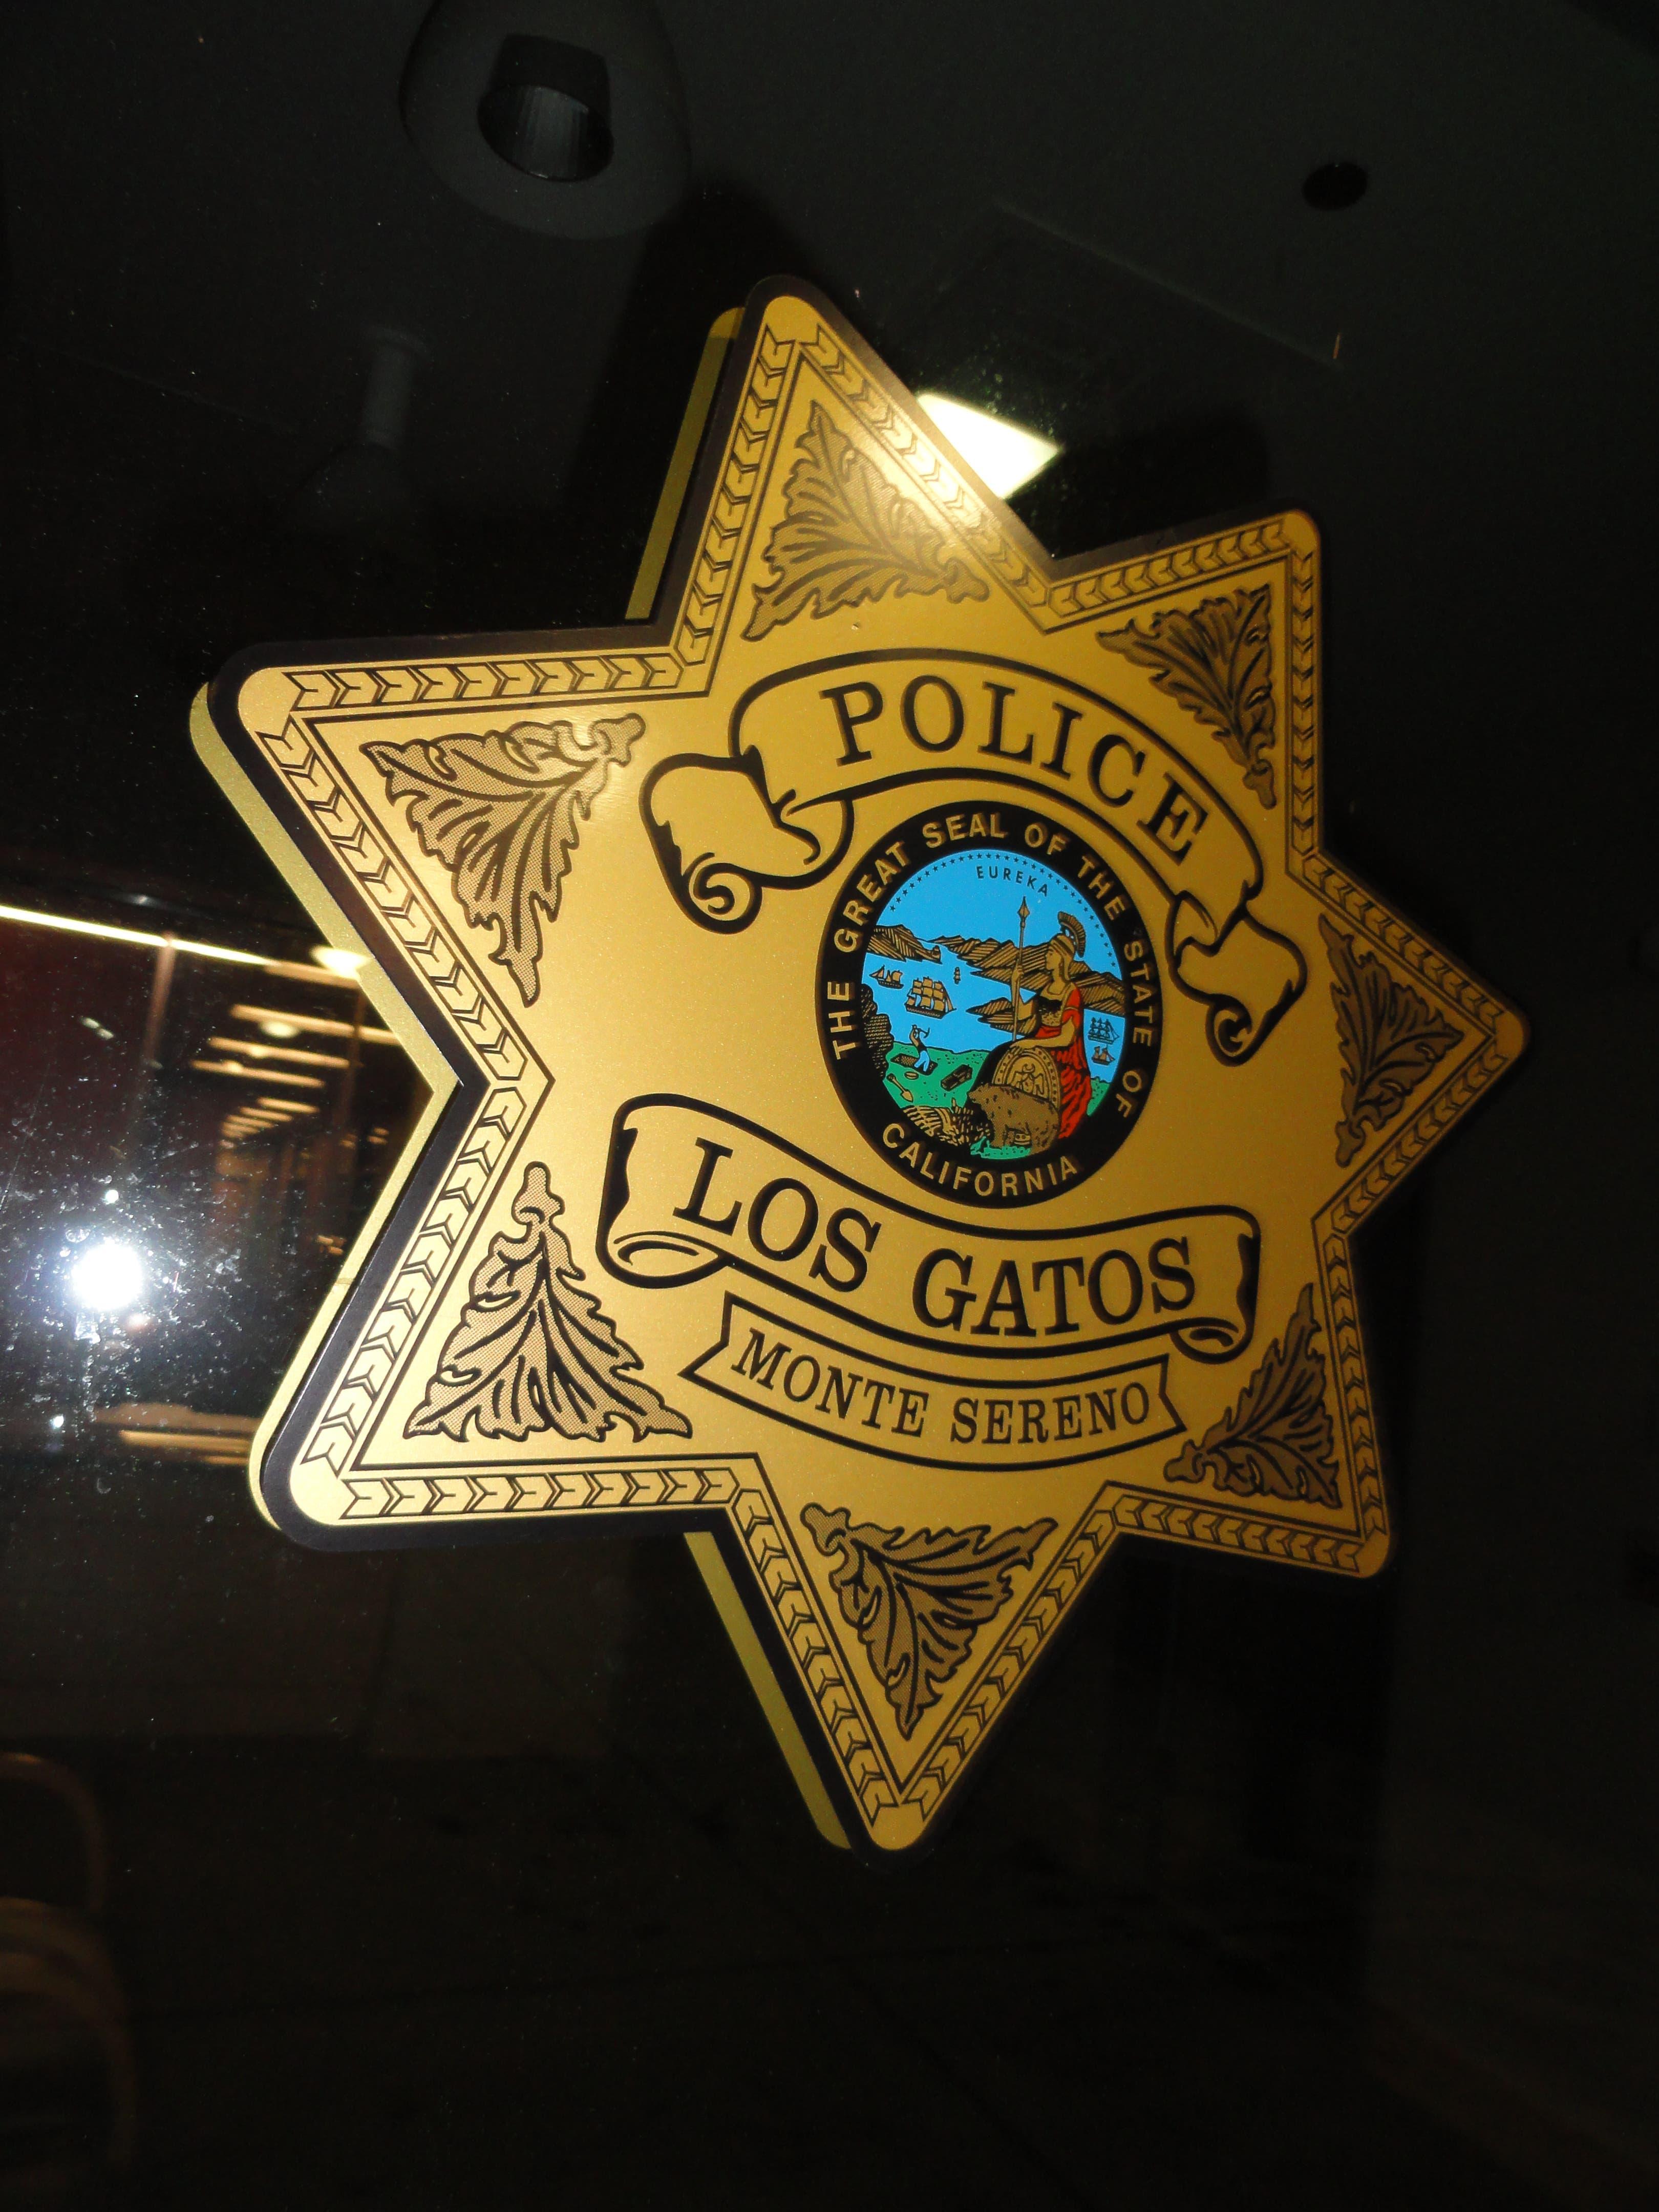 Los Gatos Police Blotter, April 16-19: Glass Meth Pipe in